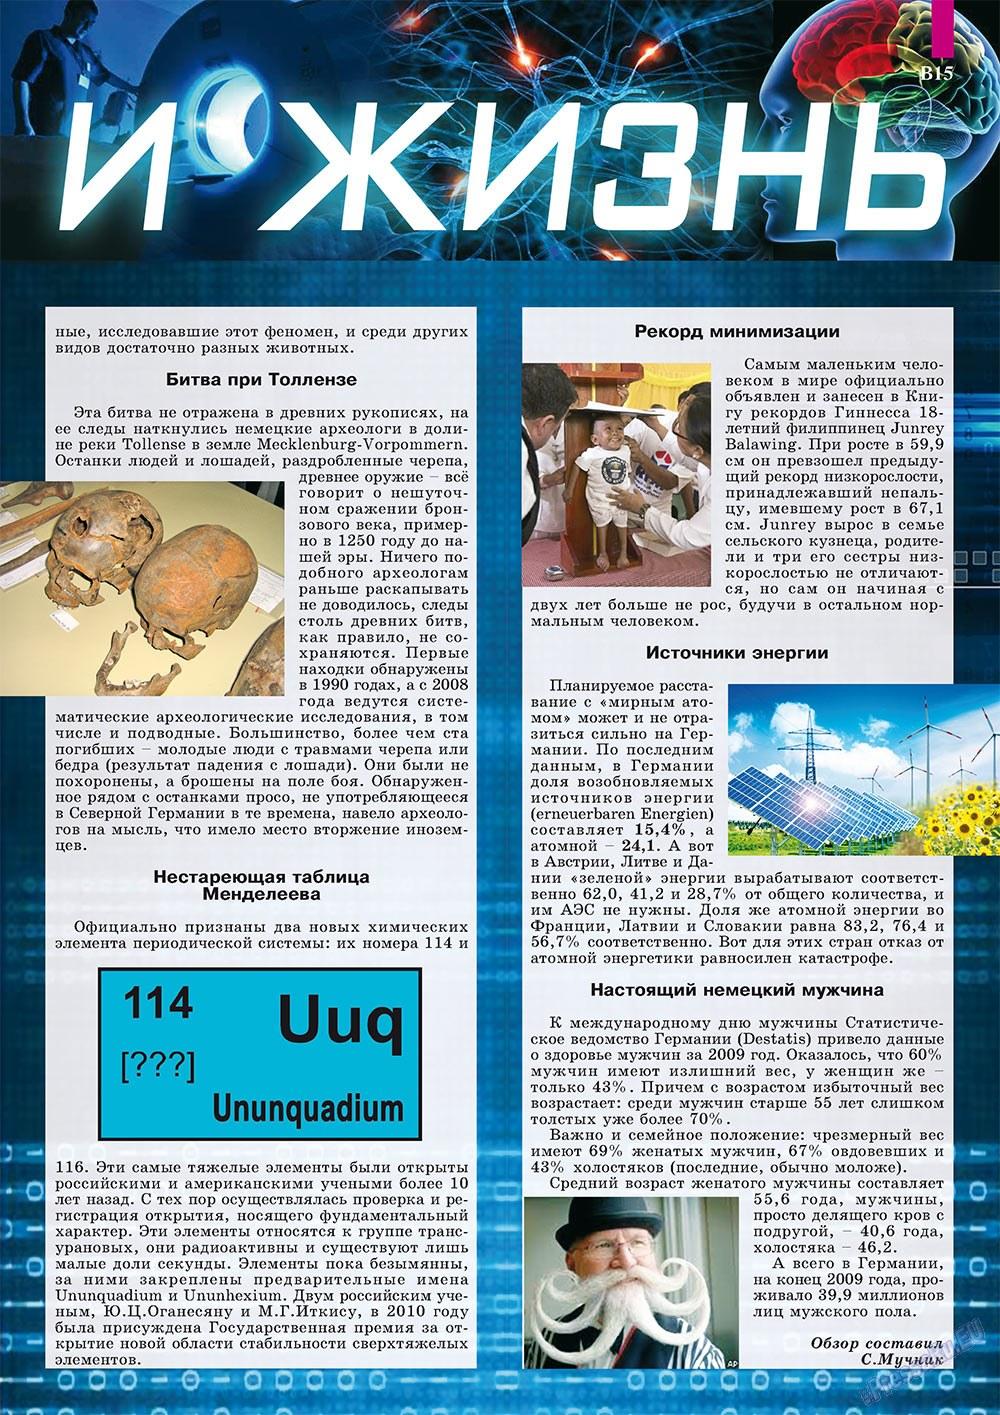 Партнер-север (журнал). 2011 год, номер 7, стр. 25